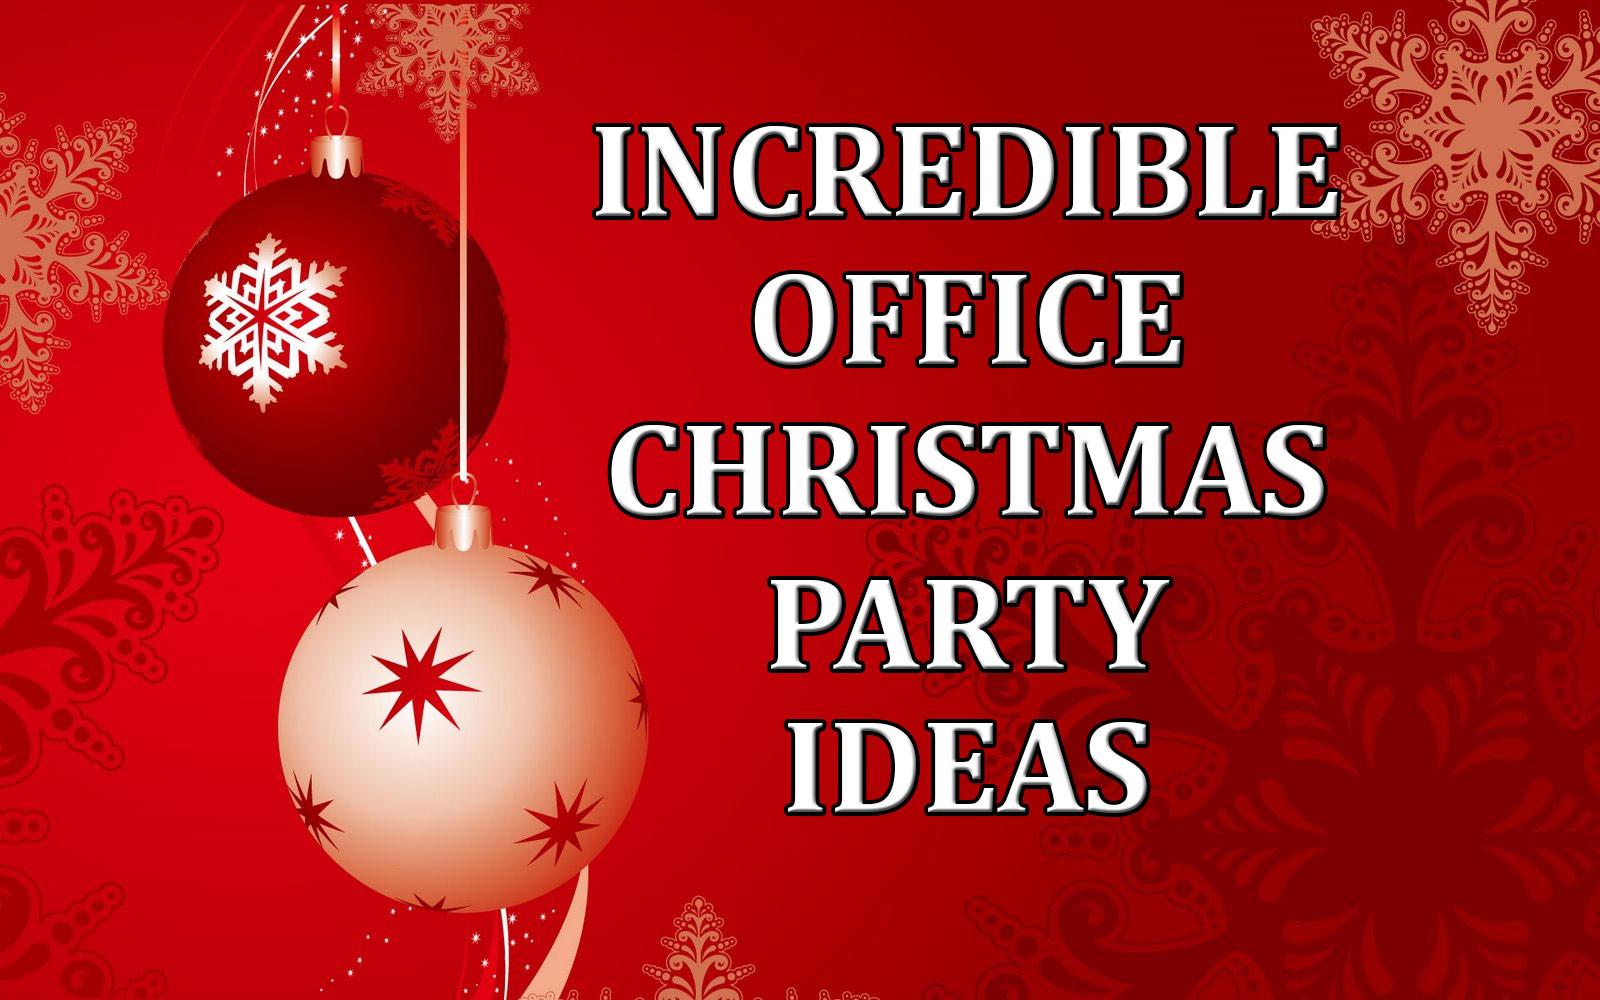 Fun Office Christmas Party Ideas  Incredible fice Christmas Party Ideas edy Ventriloquist